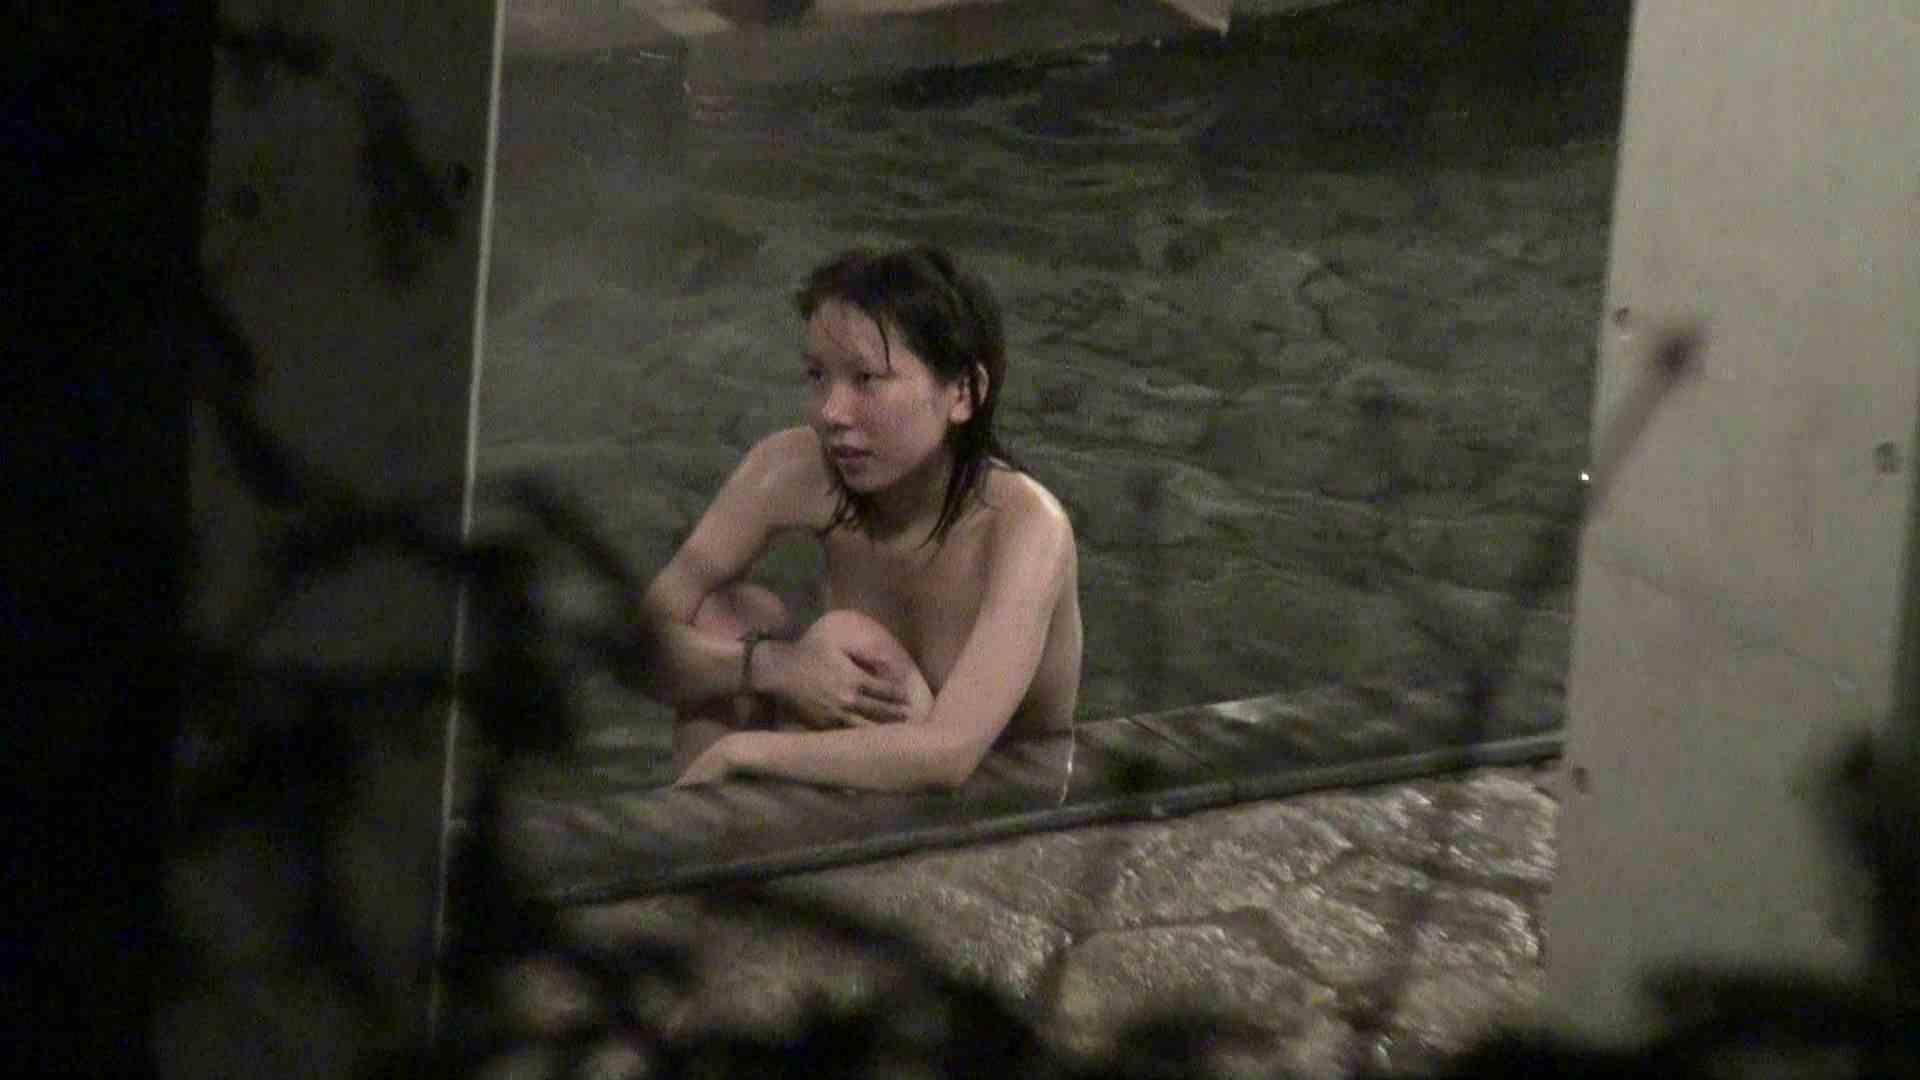 Aquaな露天風呂Vol.363 露天 覗きおまんこ画像 90画像 17